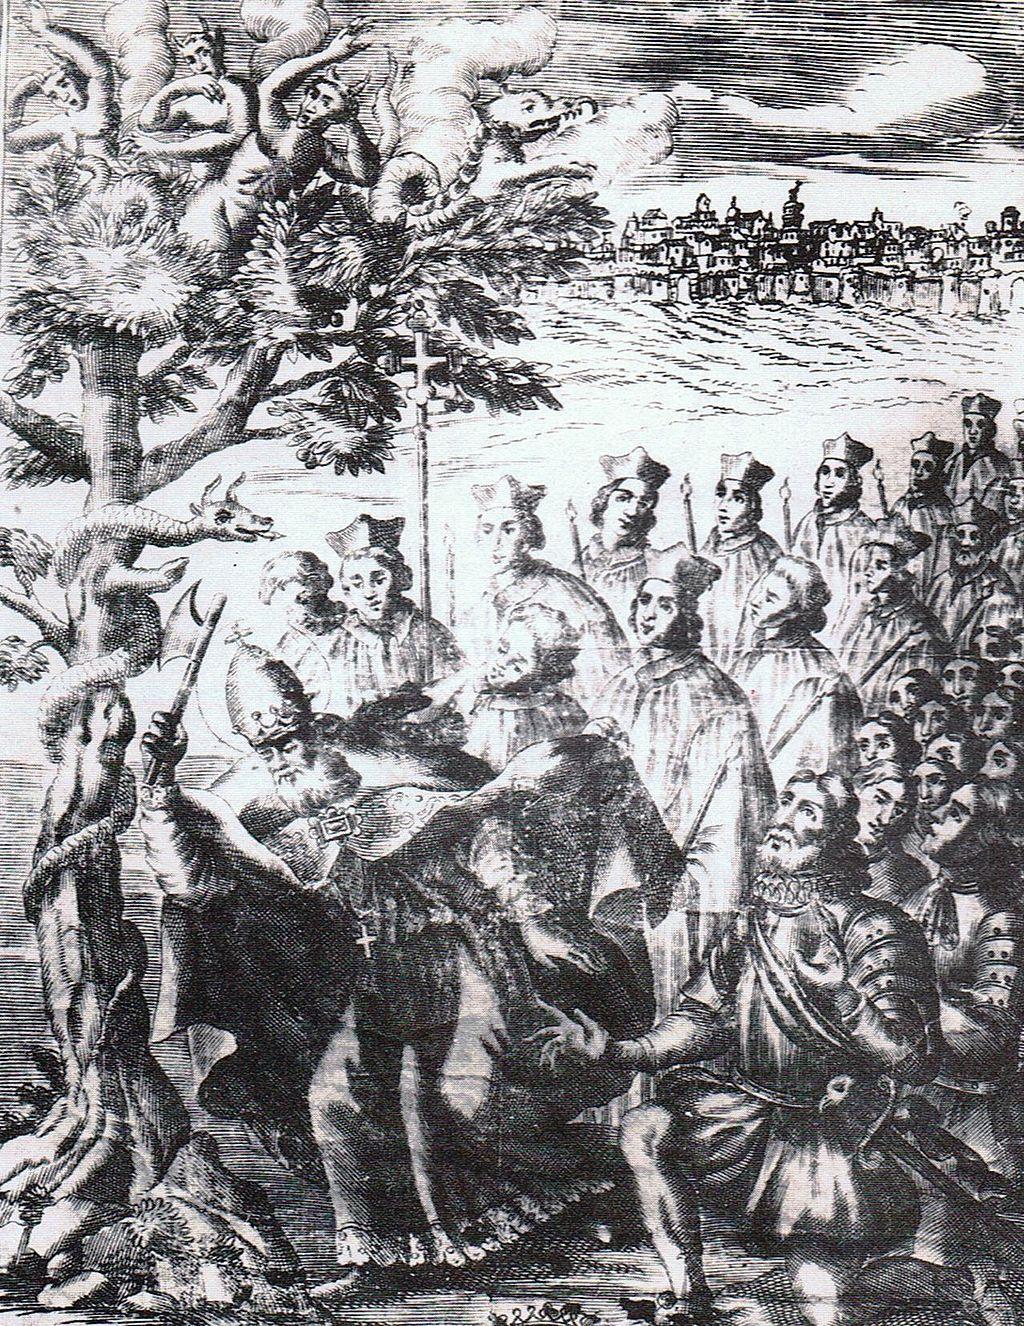 San Barbato knocks down the walnut (18th century Benevento engraving)